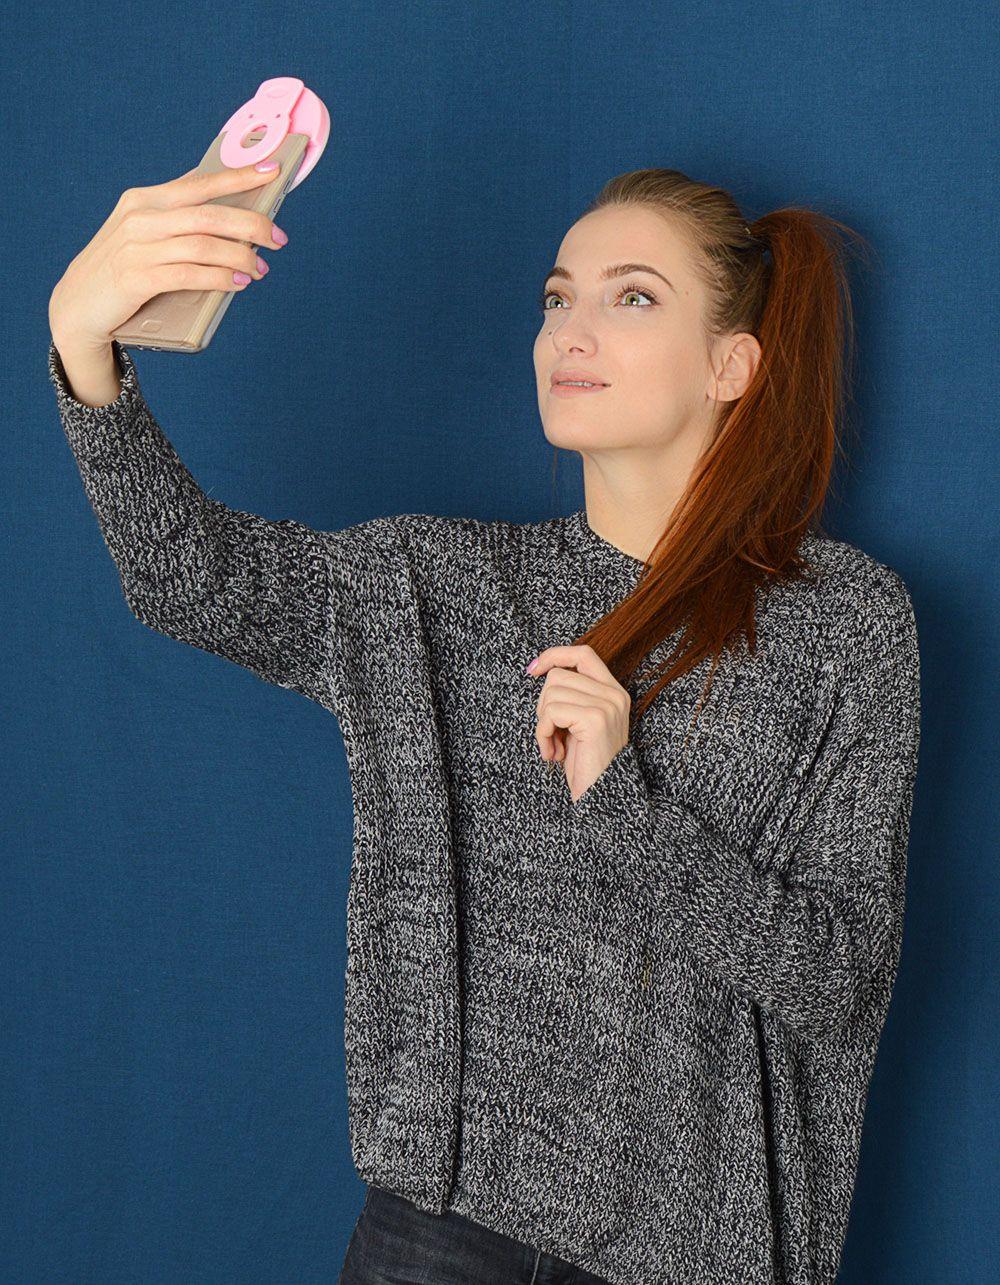 Лайтрінг Smartphone Led Flash | 233331-14-XX